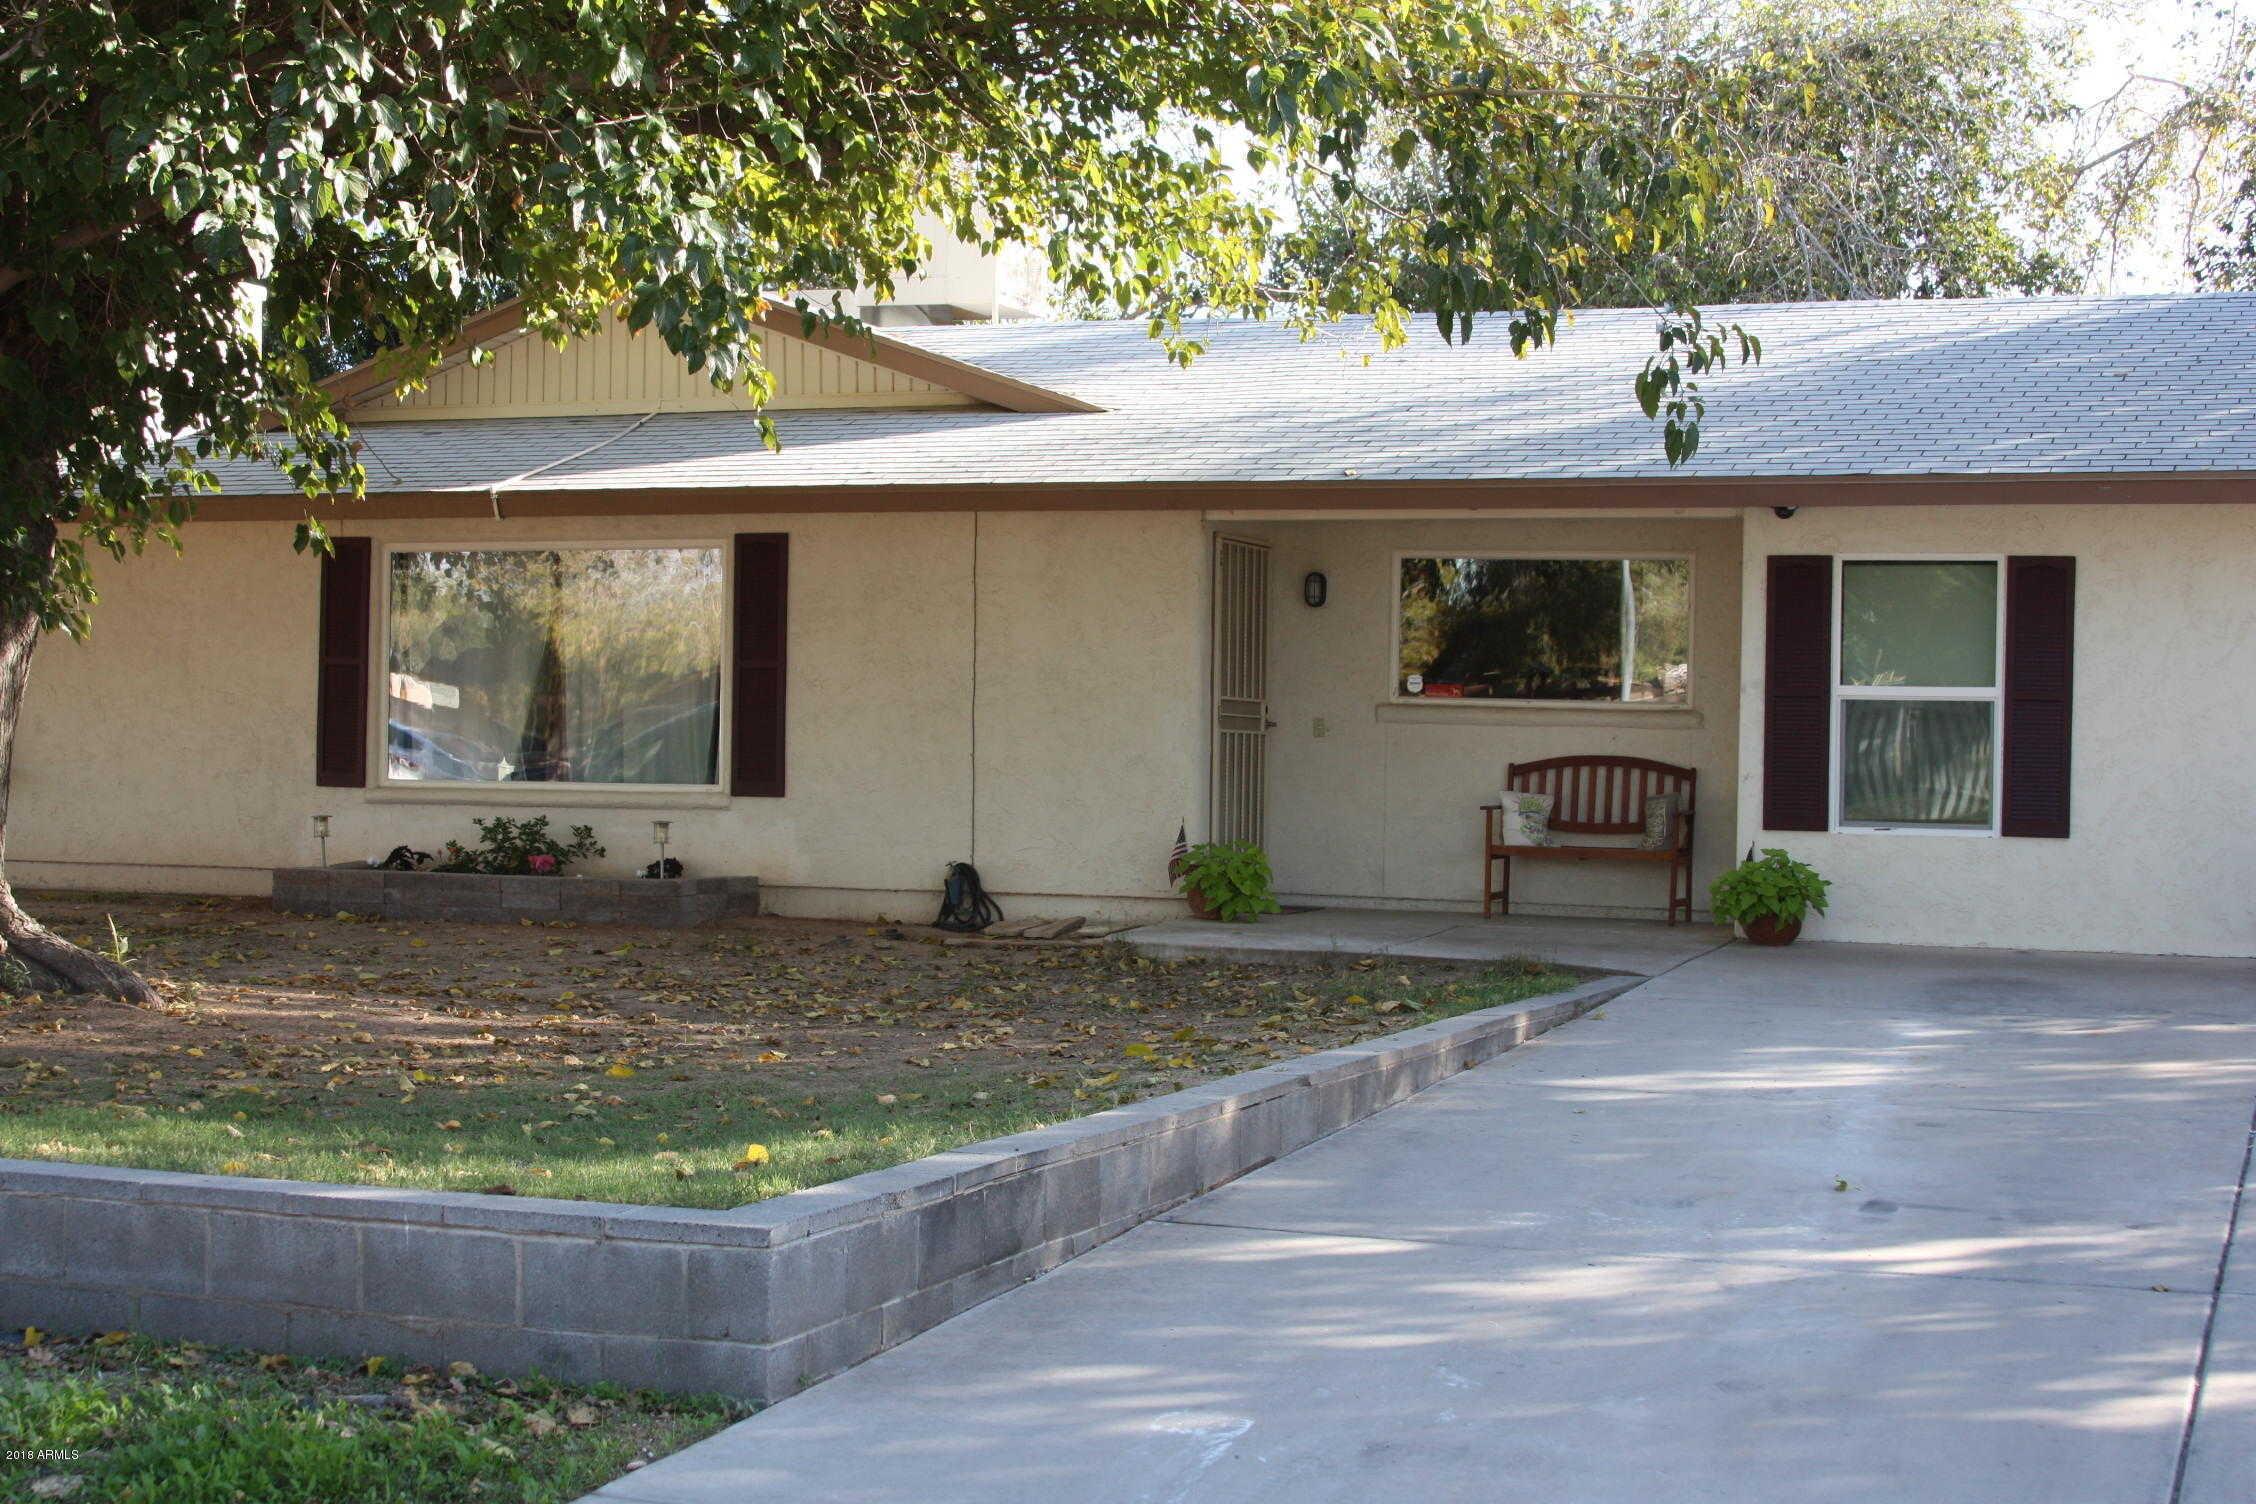 $370,000 - 3Br/2Ba - Home for Sale in Sunburst Farms 21, Glendale